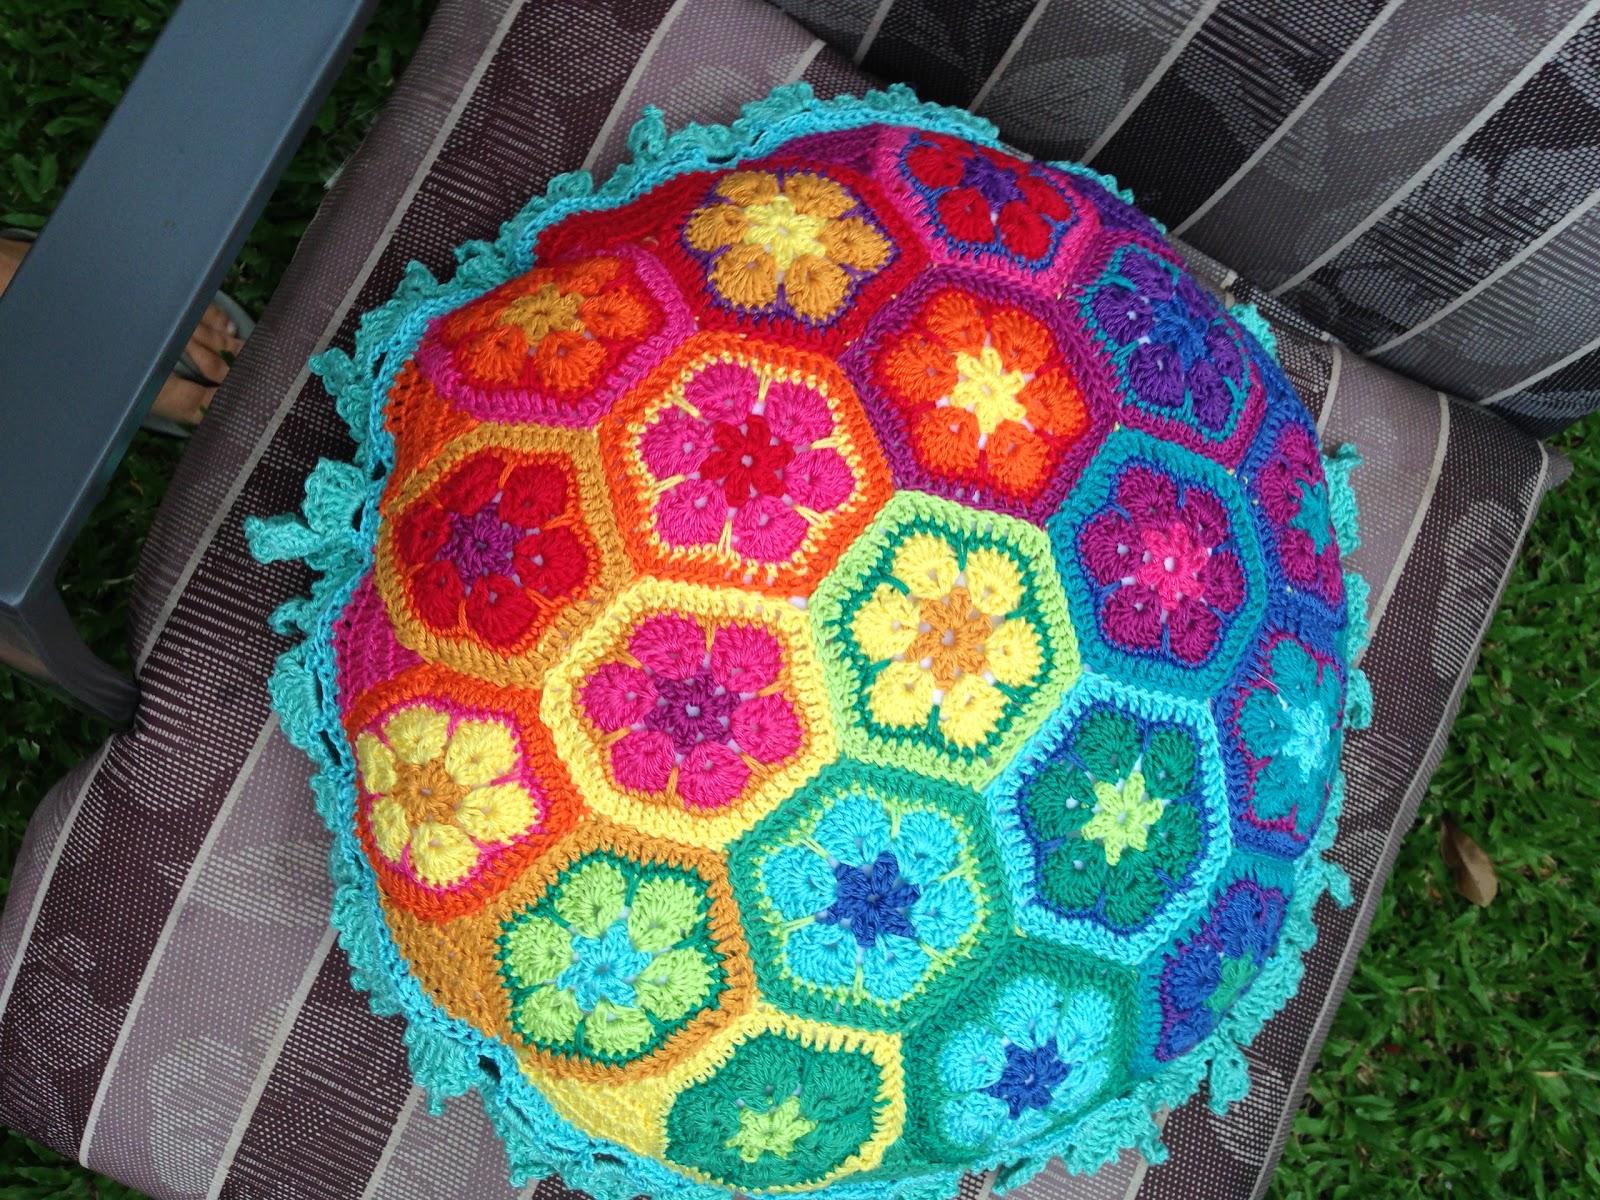 Faerytale Crochet: Rainbow African Flower Pillow